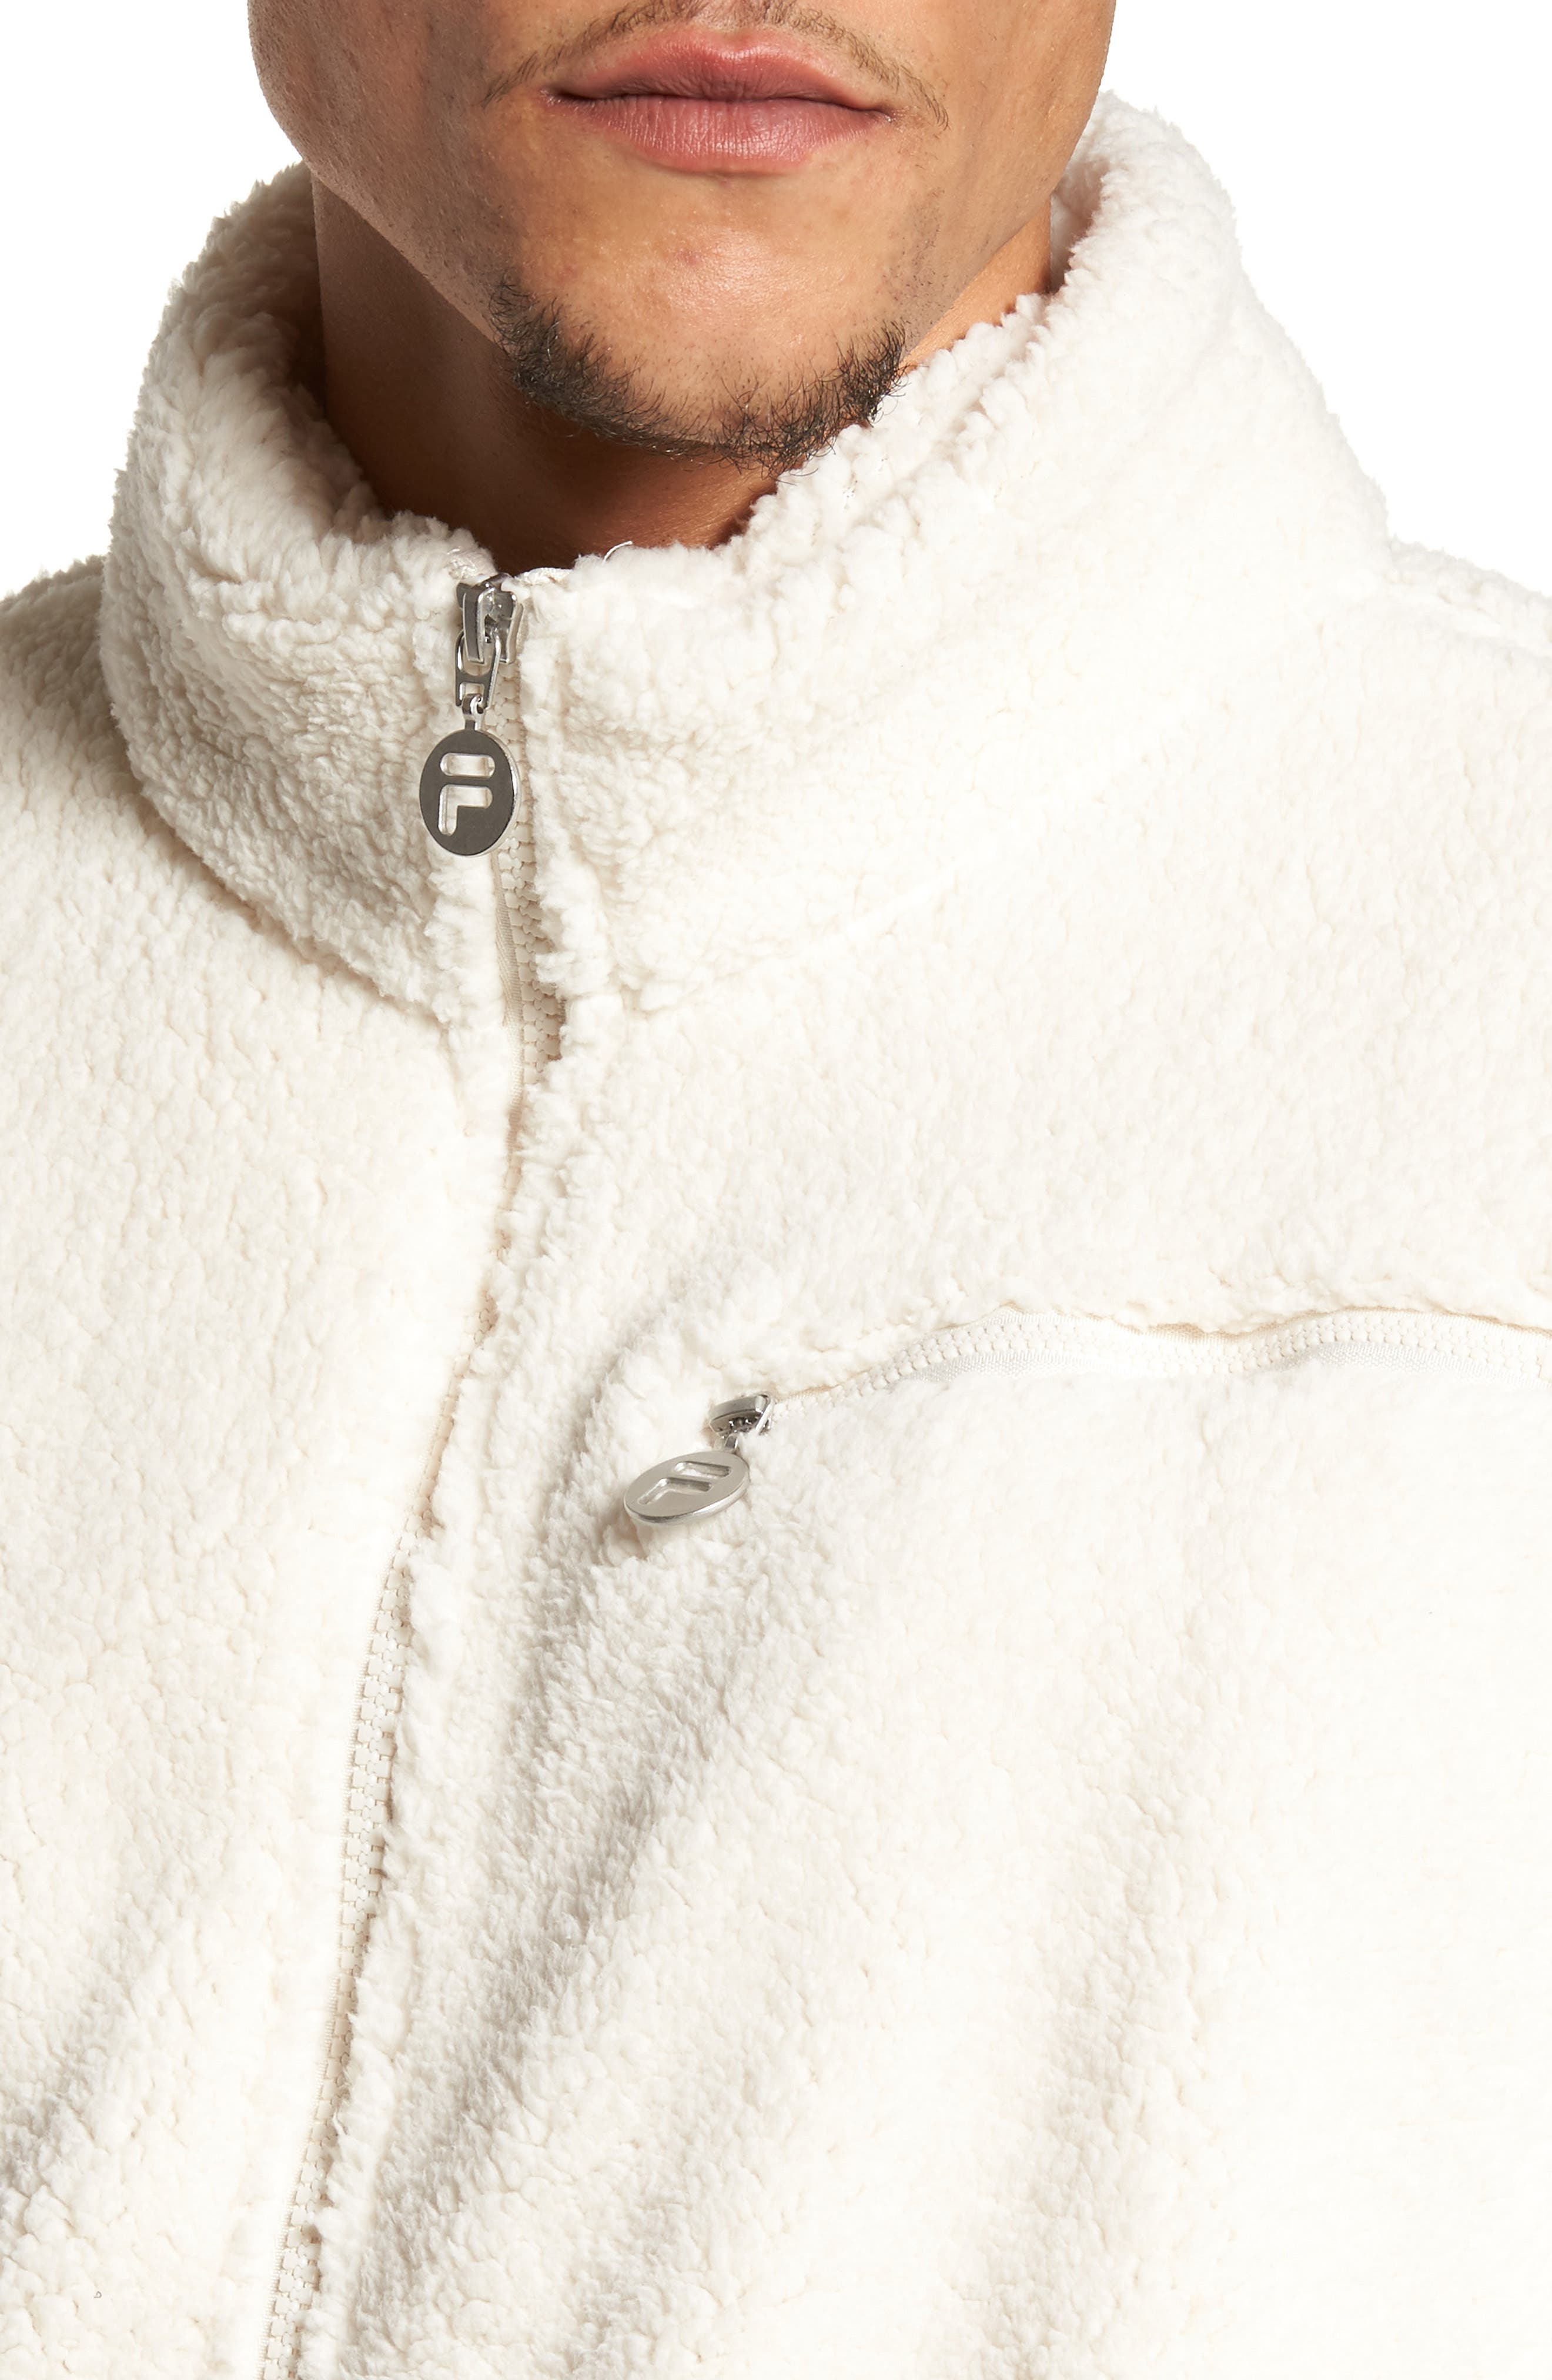 Finlay Fleece Jacket,                             Alternate thumbnail 4, color,                             Gardenia/ Navy/ Chinese Red